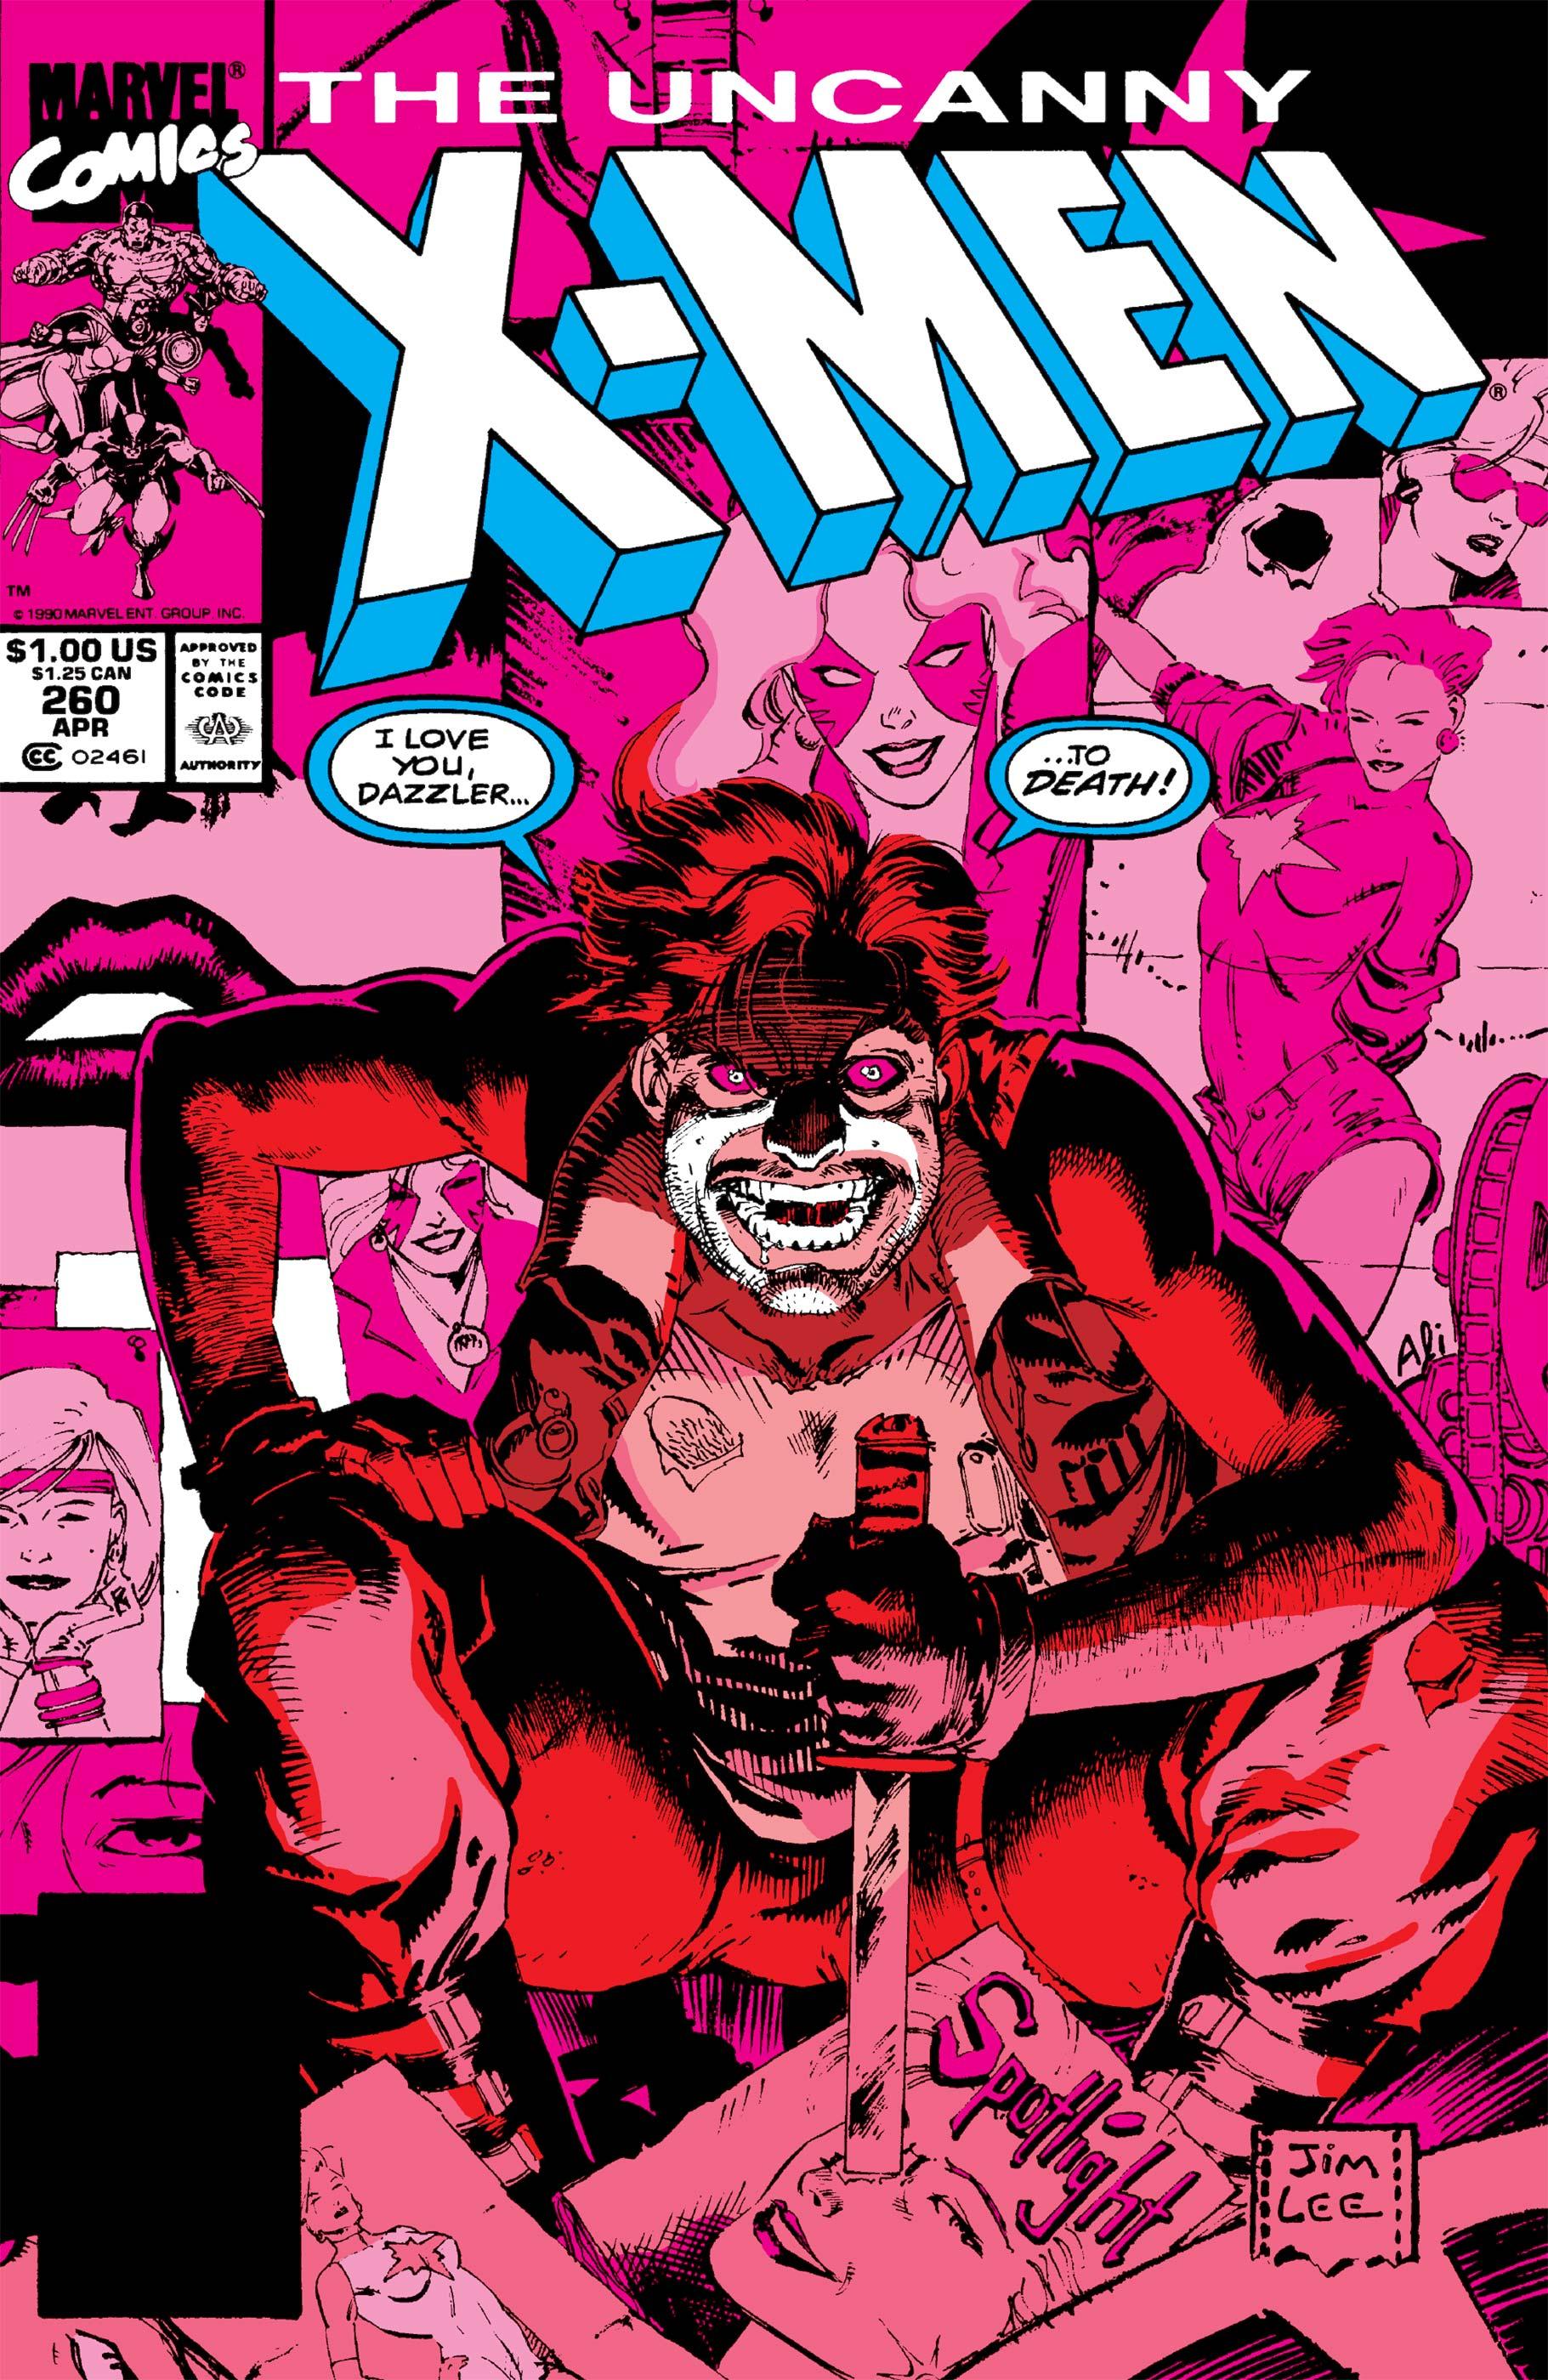 Uncanny X-Men (1963) #260